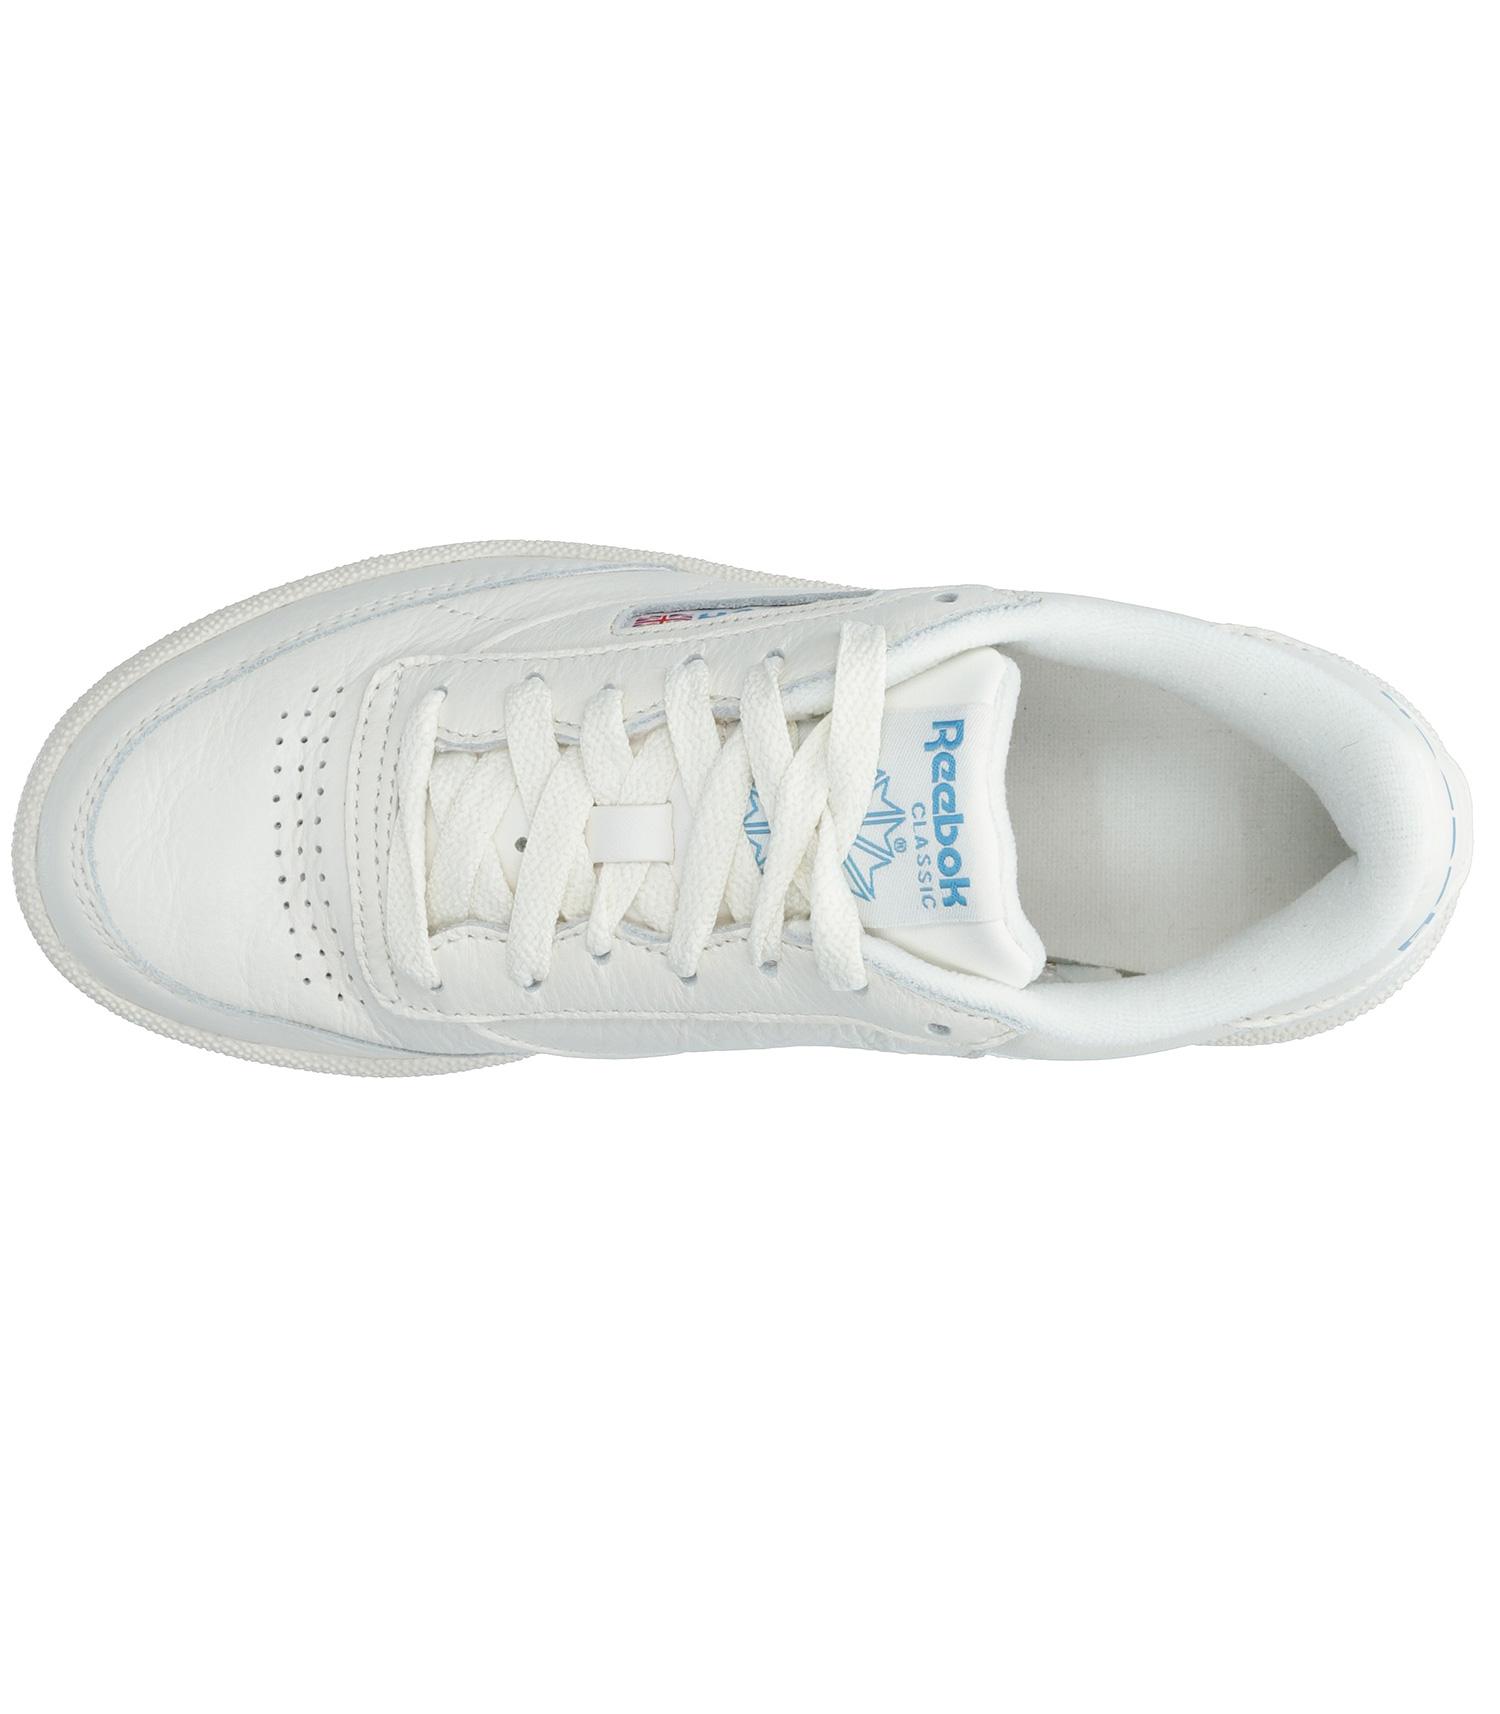 Sneakers Reebok Club C 85 ChalkPaperwhiteCyan Reebok Jane de Boy